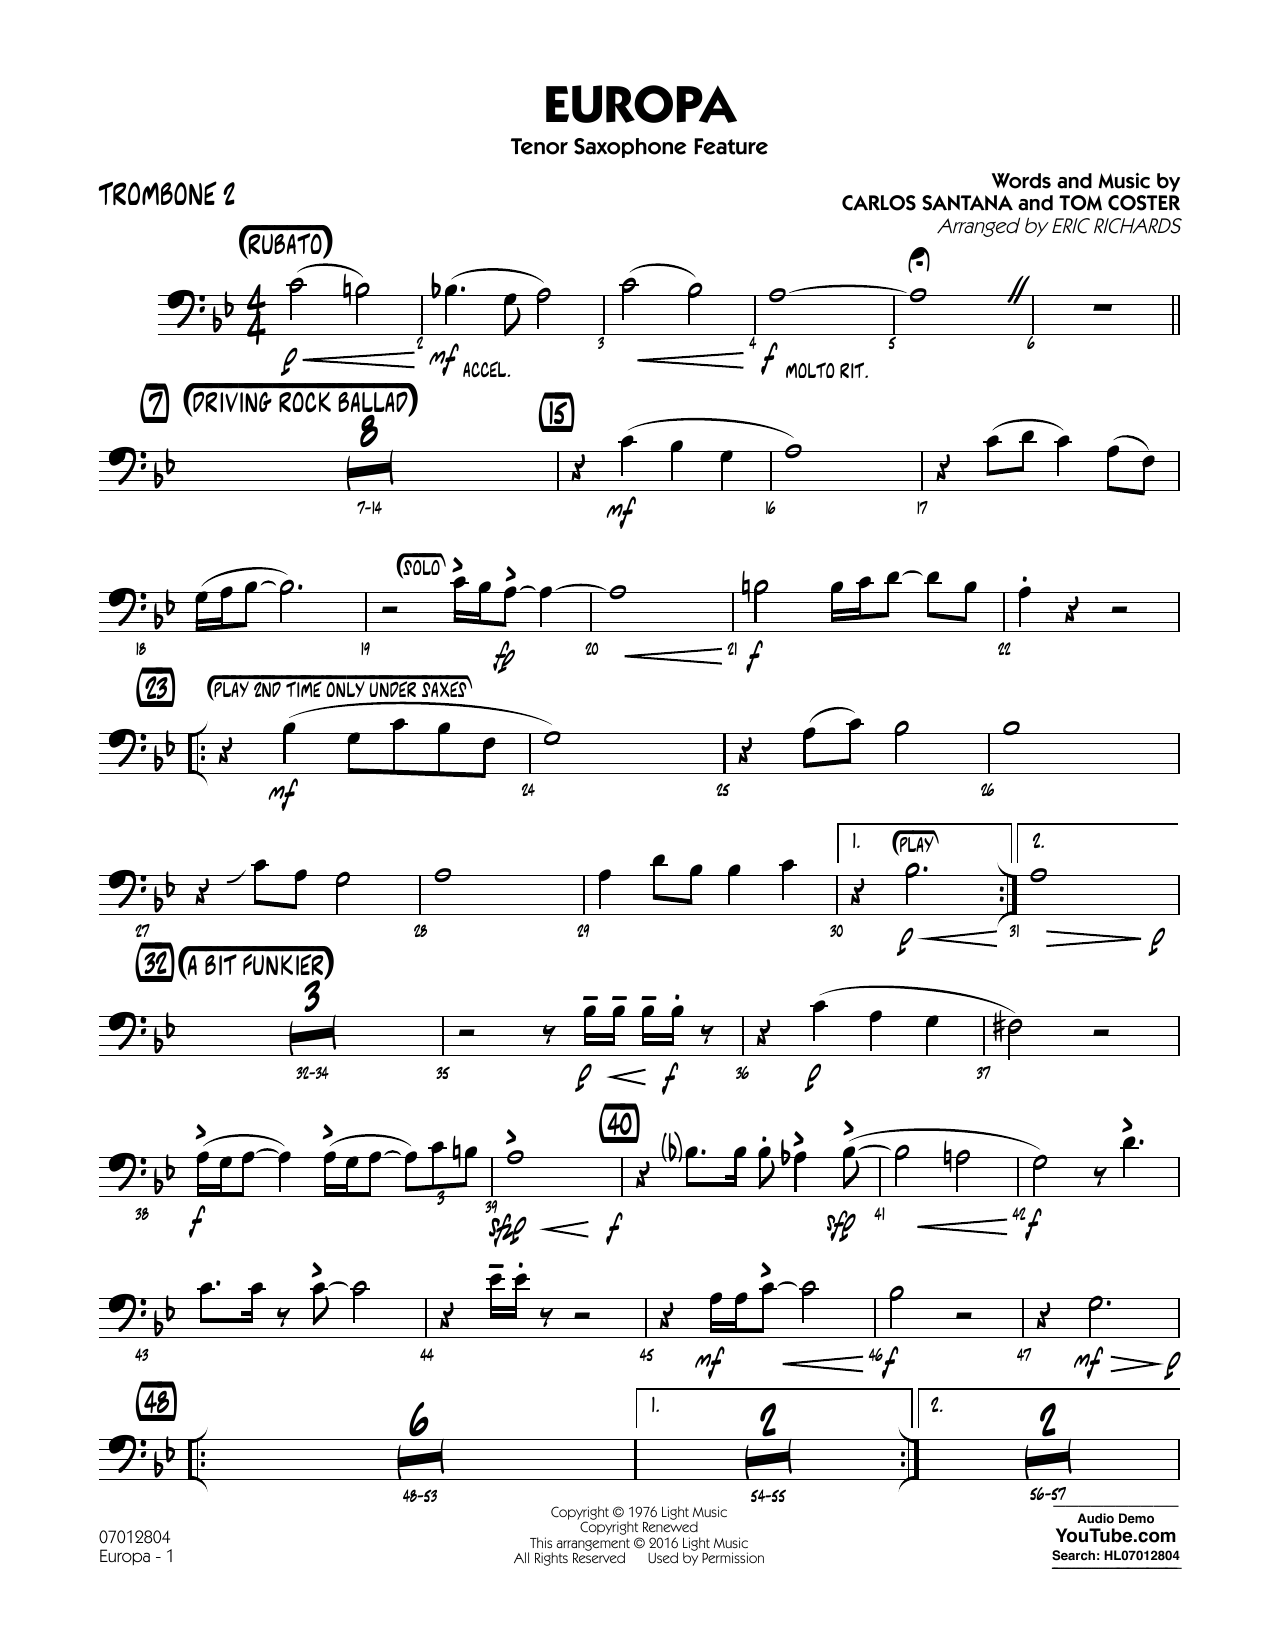 Tom Coster - Europa - Trombone 2